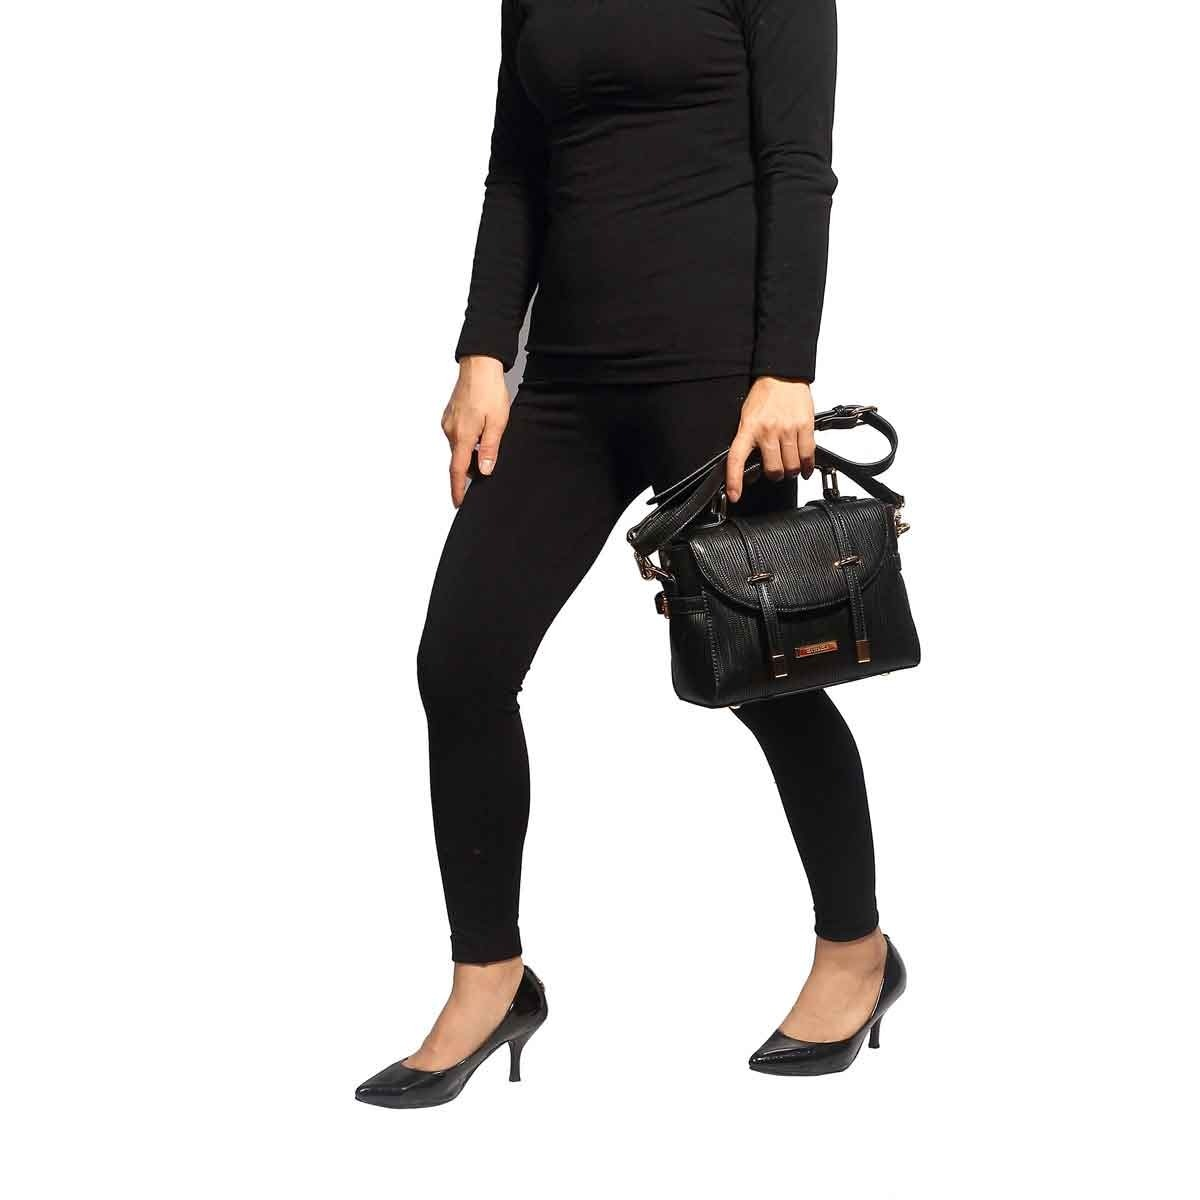 bolsa feminina tiracolo alça transversal preta macadâmia. Carregando zoom. 7ab5dc93b4b